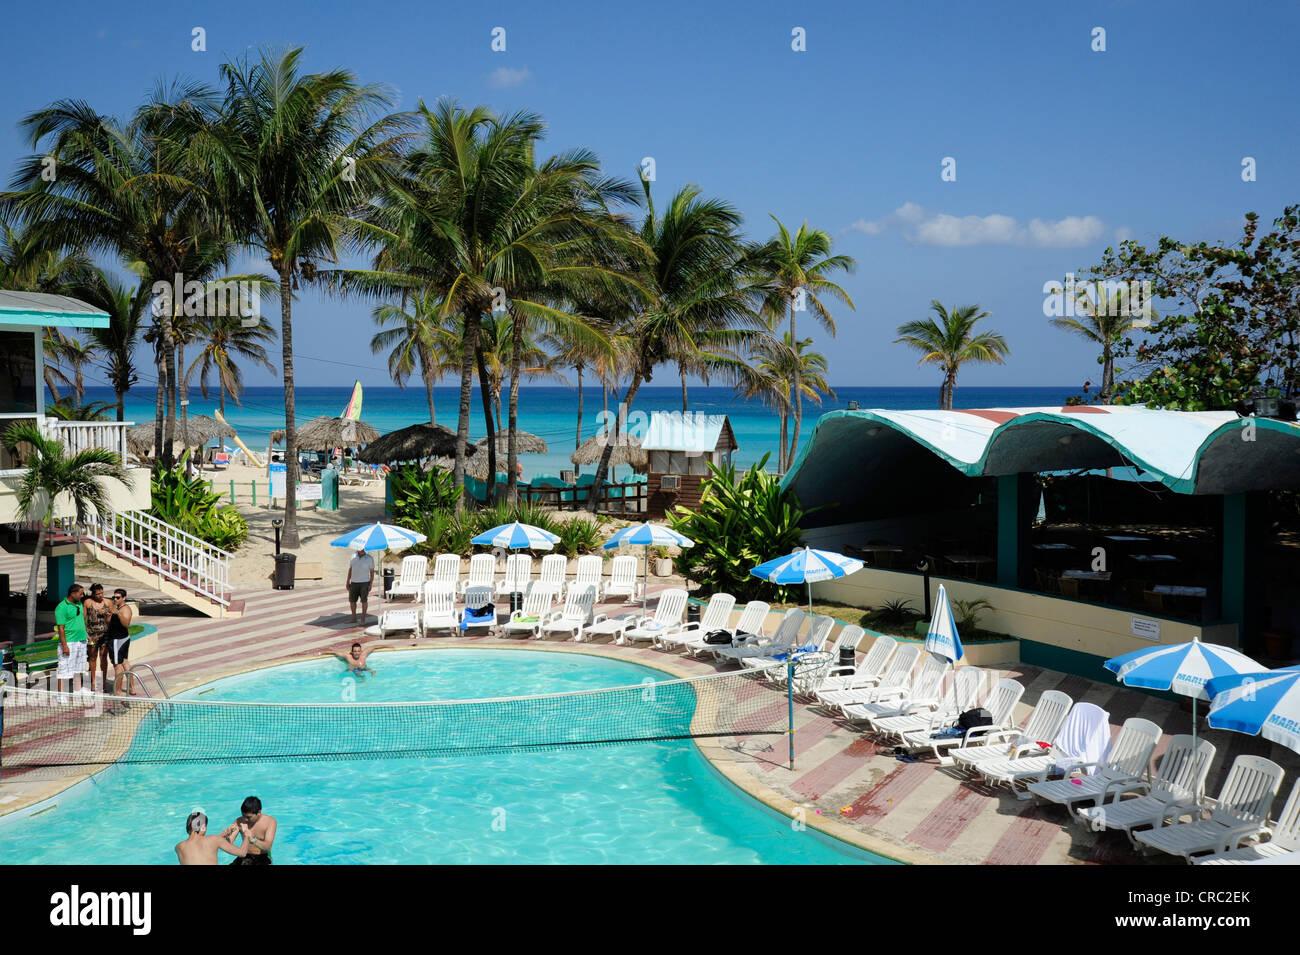 Hotel Atlantico, Schwimmbad und Strand mit Palmen, Santa Maria del Mar, Playas del Este, Havanna, Habana, Cuba Stockbild